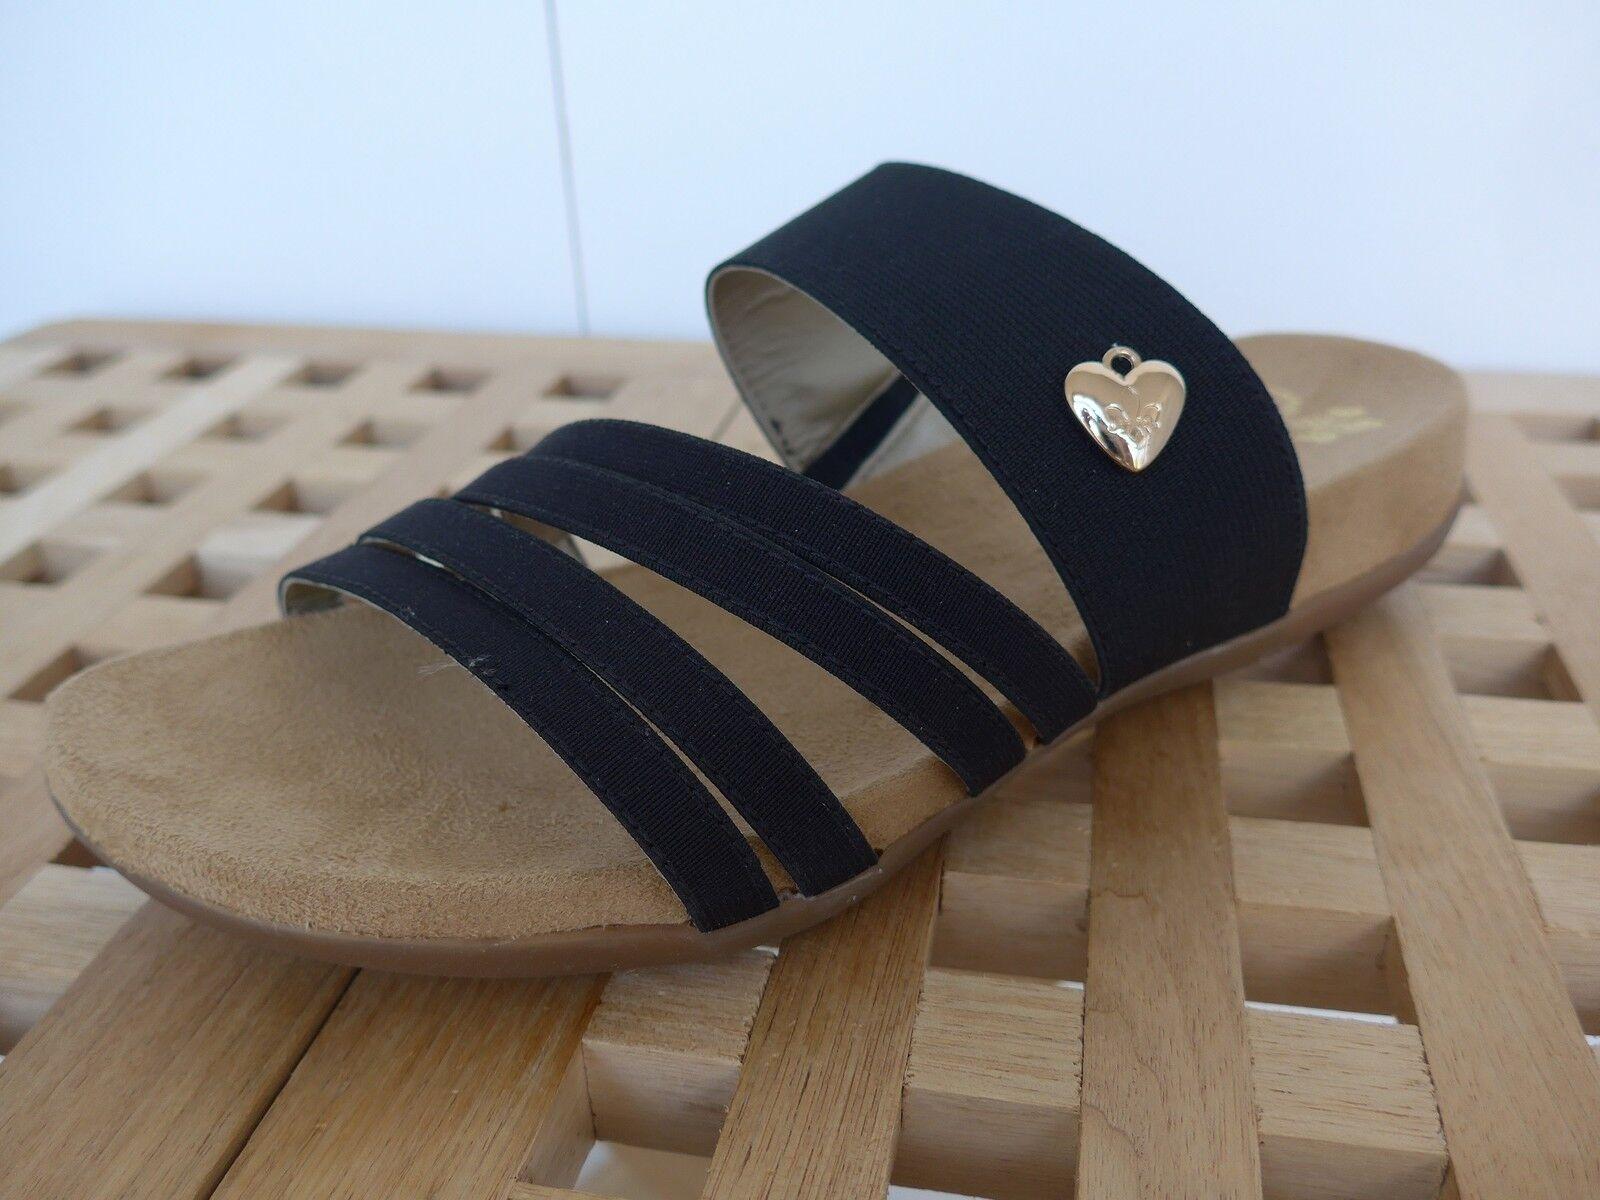 Rieker Sandale Sandalette Pantolette Gr. 38 bis 42 NEU (003)